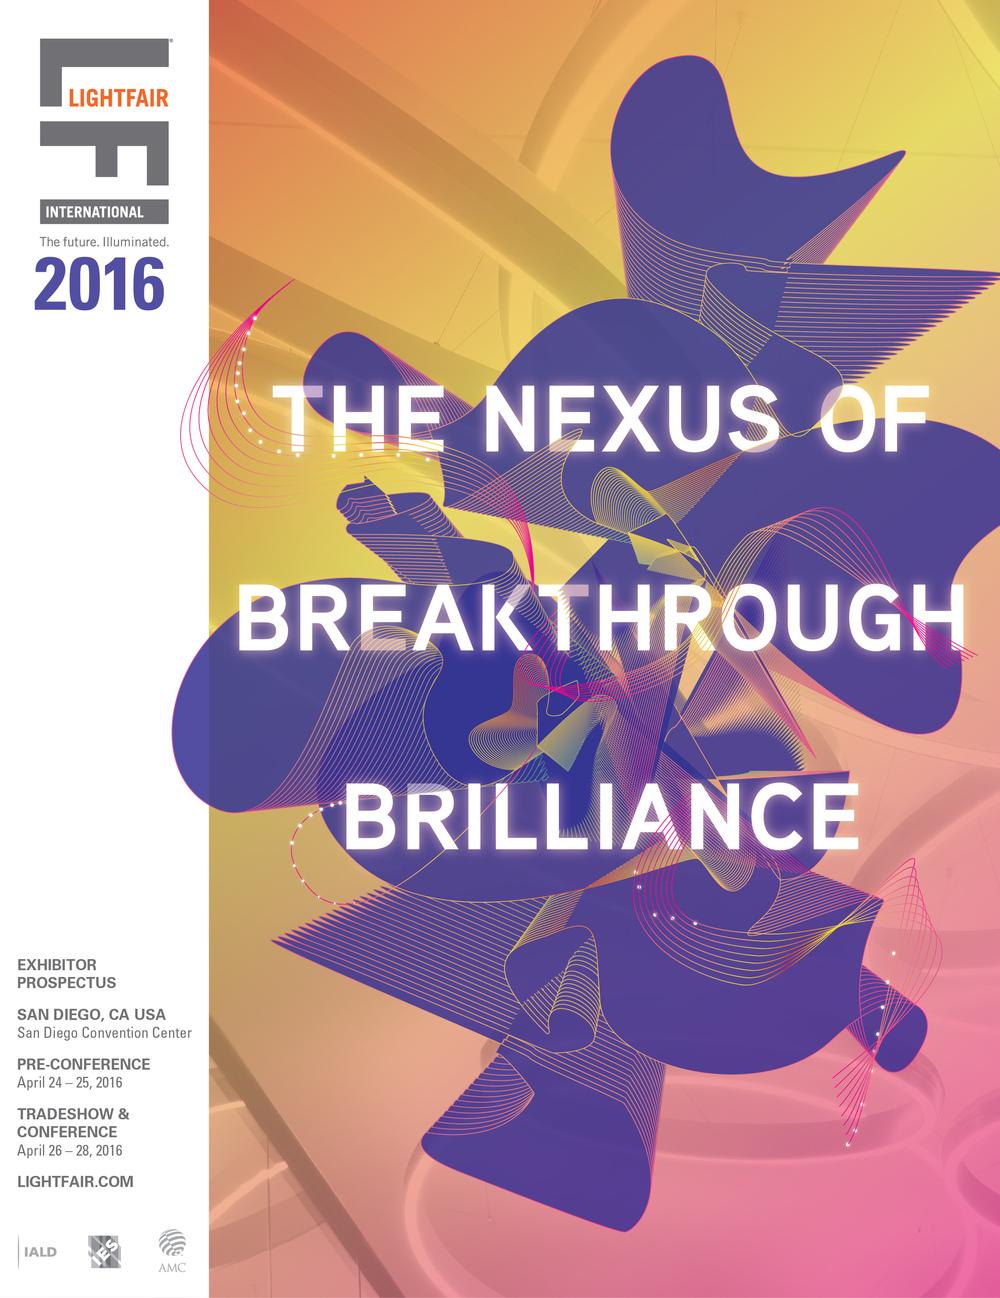 Prospectus Cover